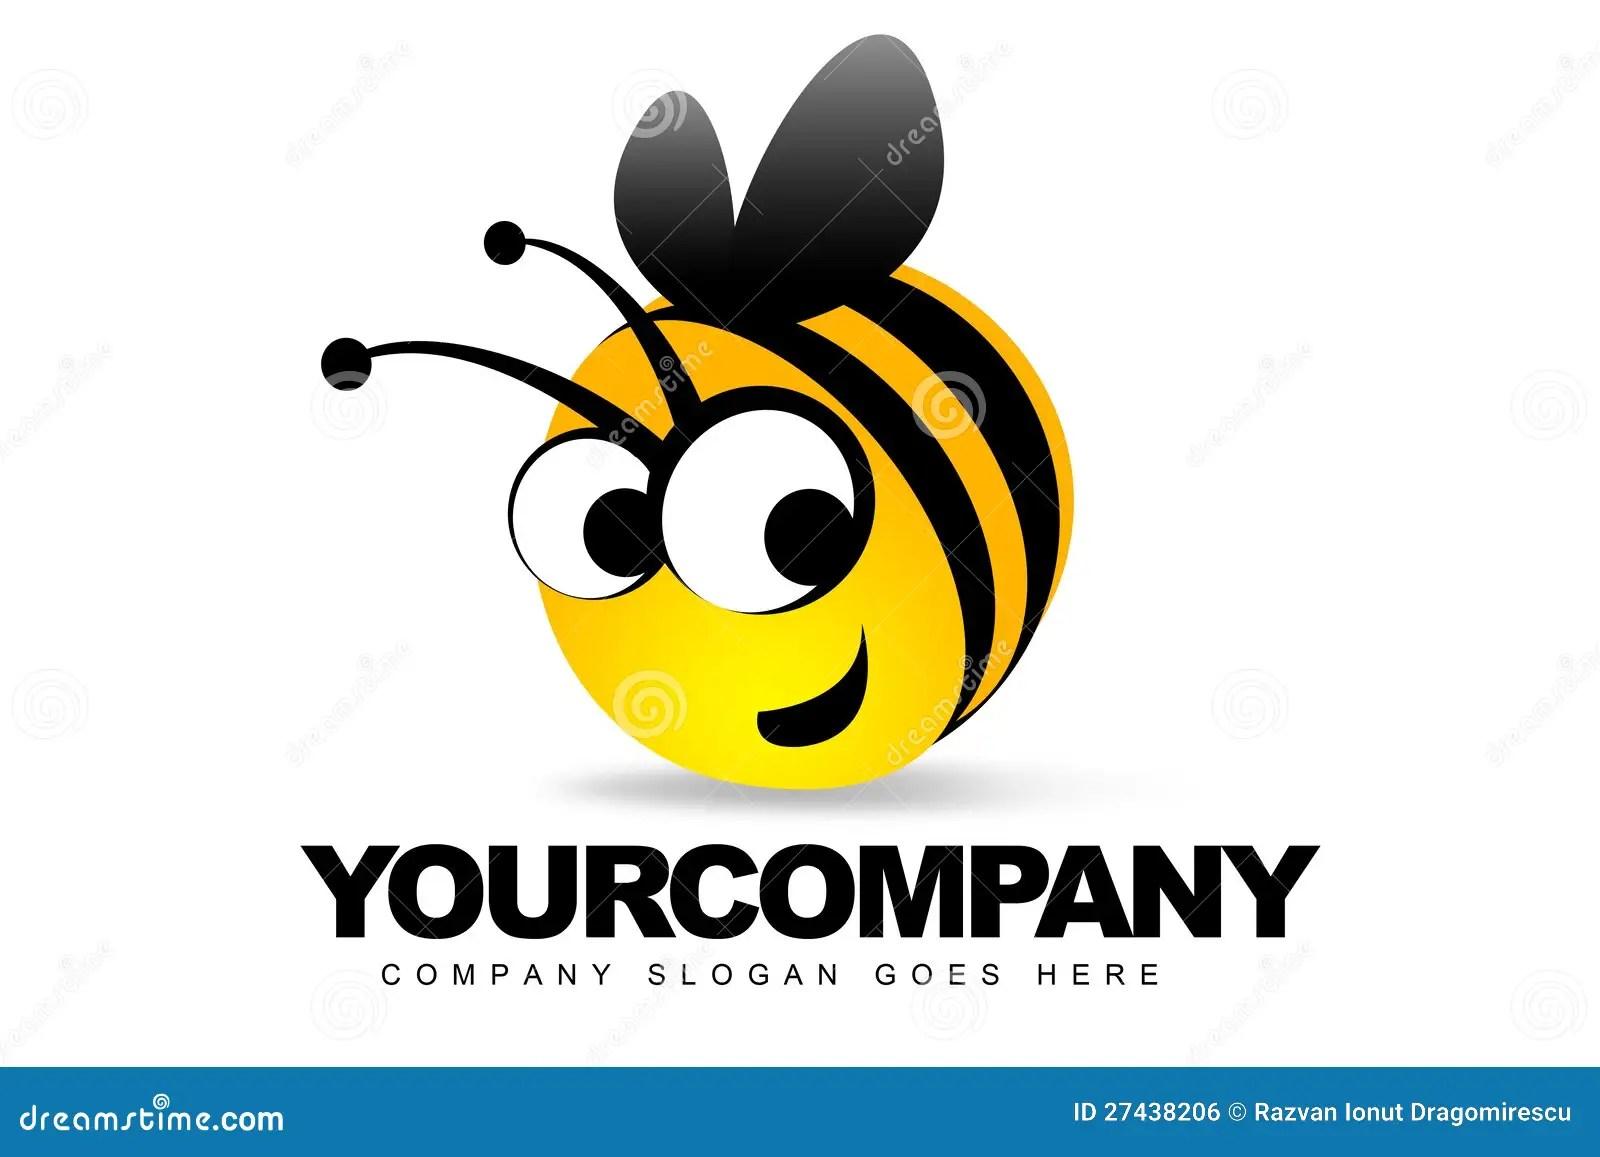 Cute Cartoon Angel Wallpaper Smiling Bee Logo Royalty Free Stock Image Image 27438206